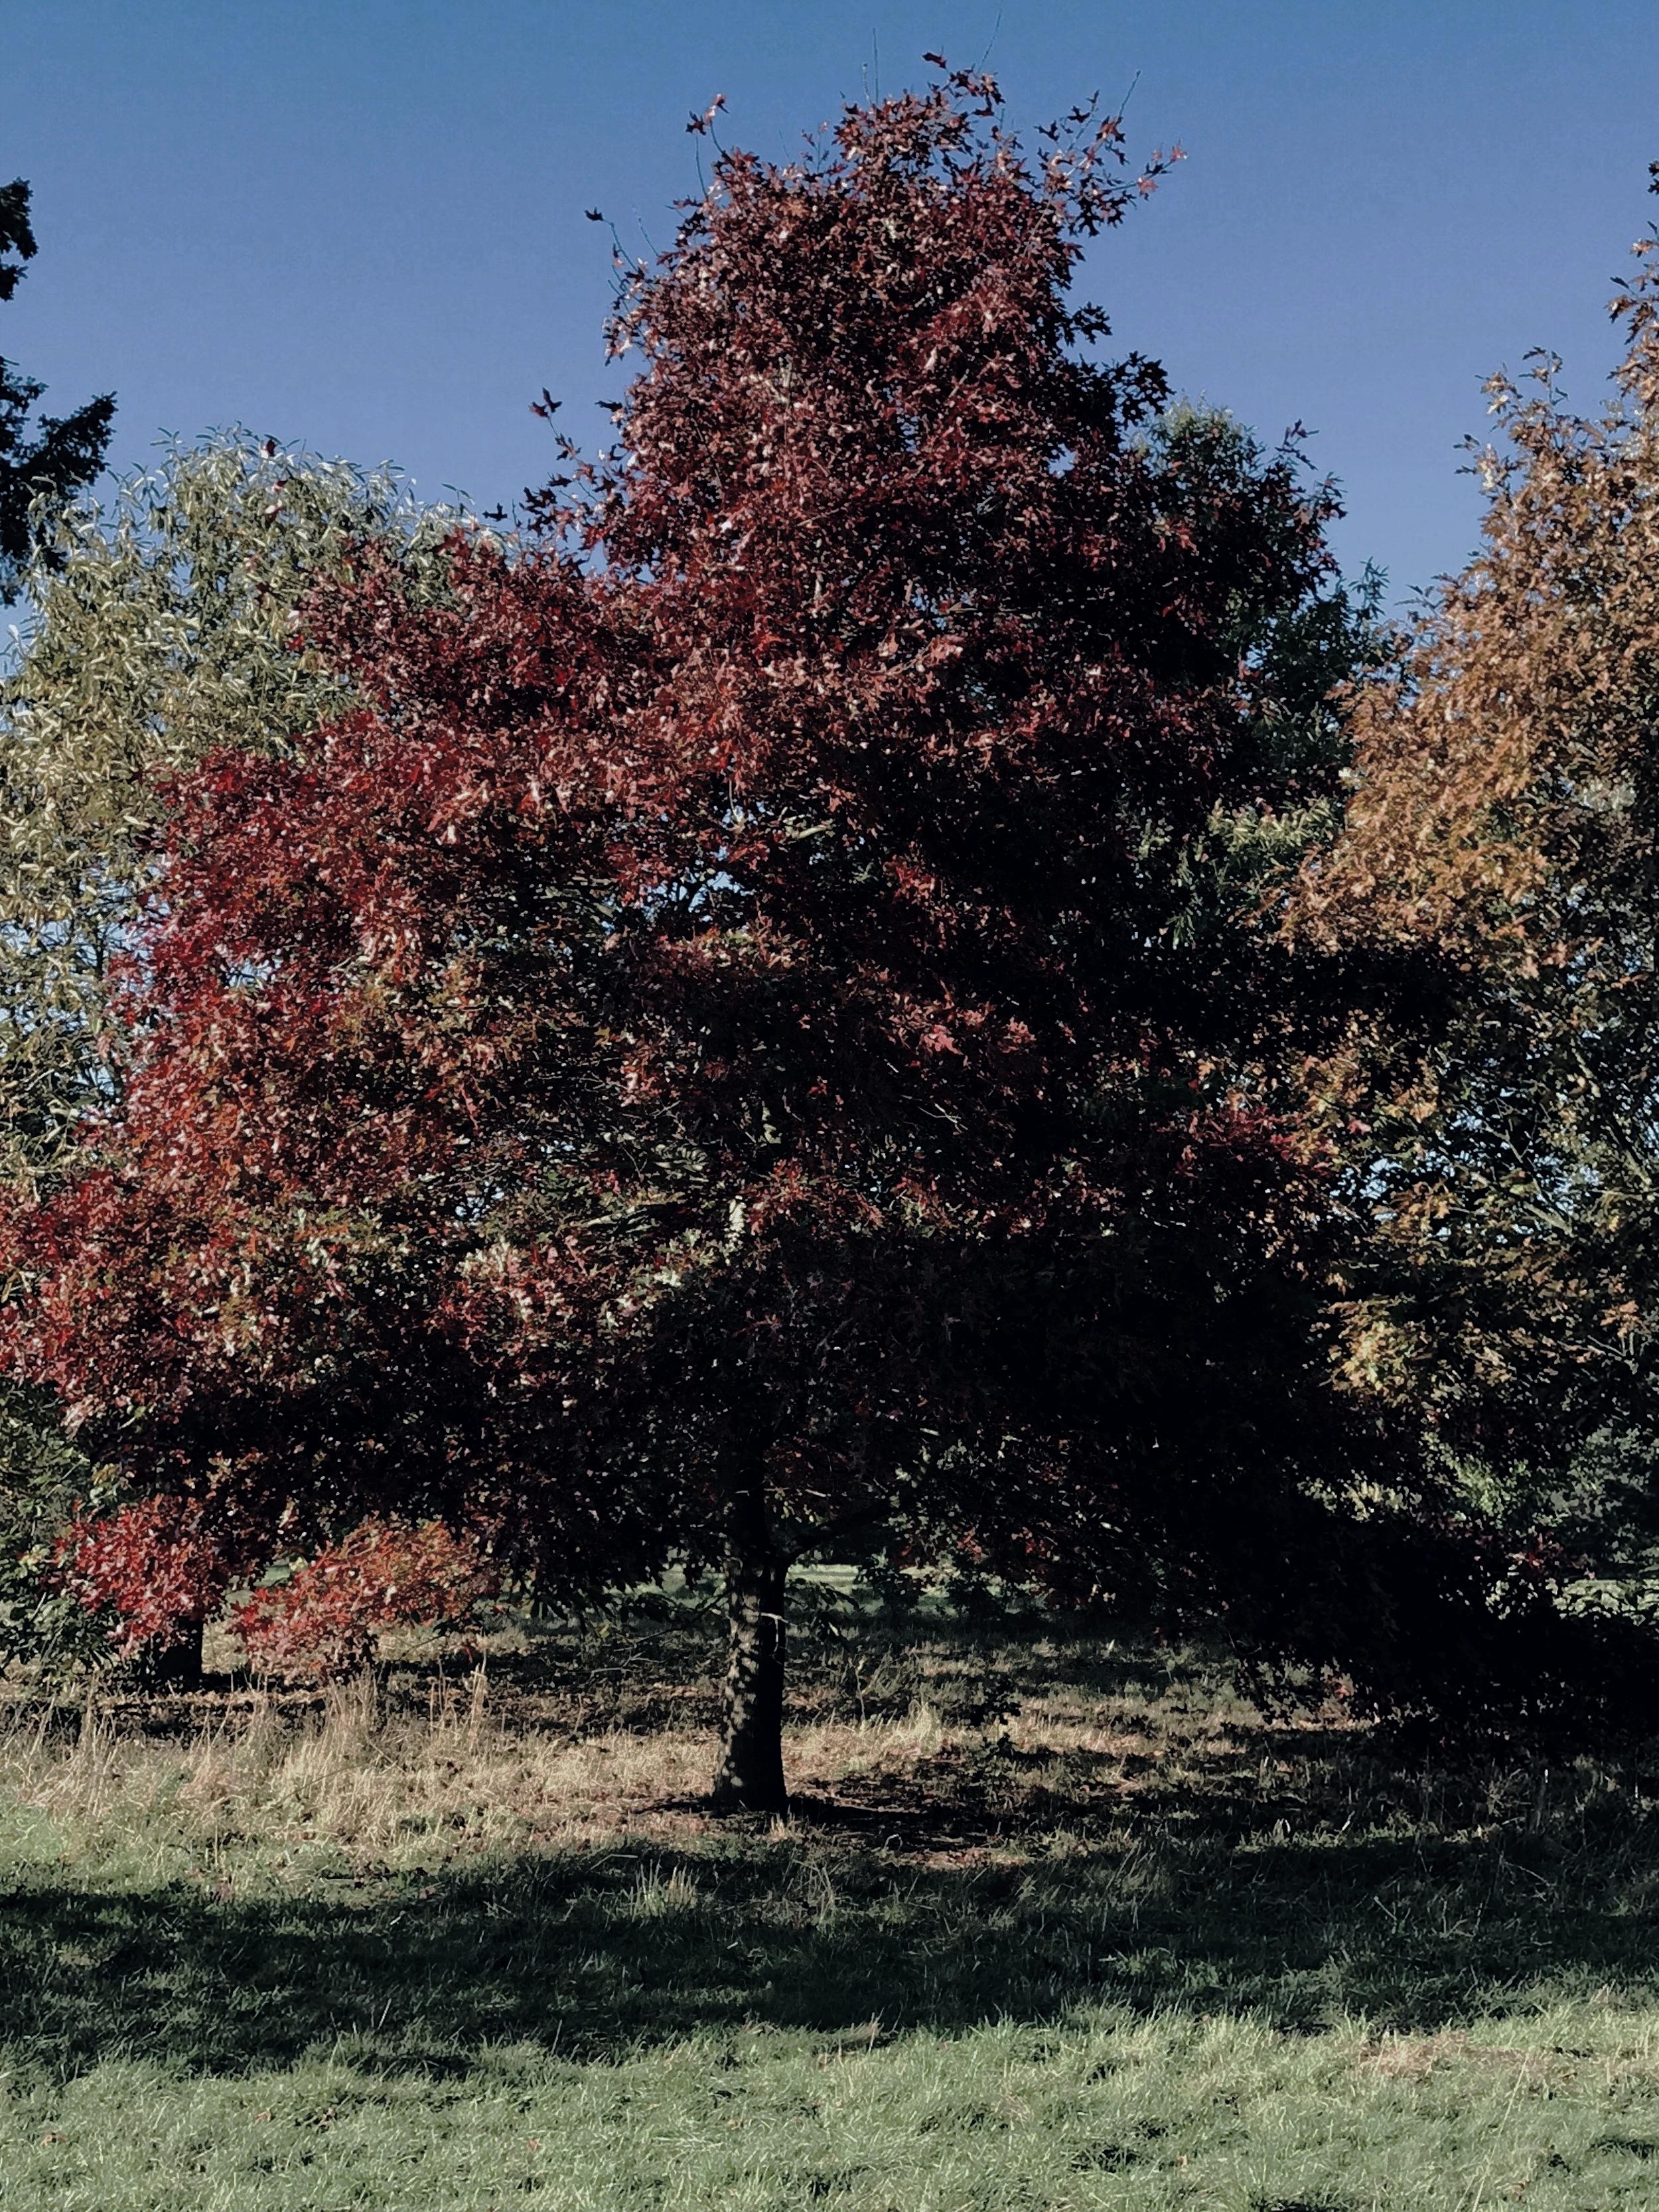 hug a tree in autumn